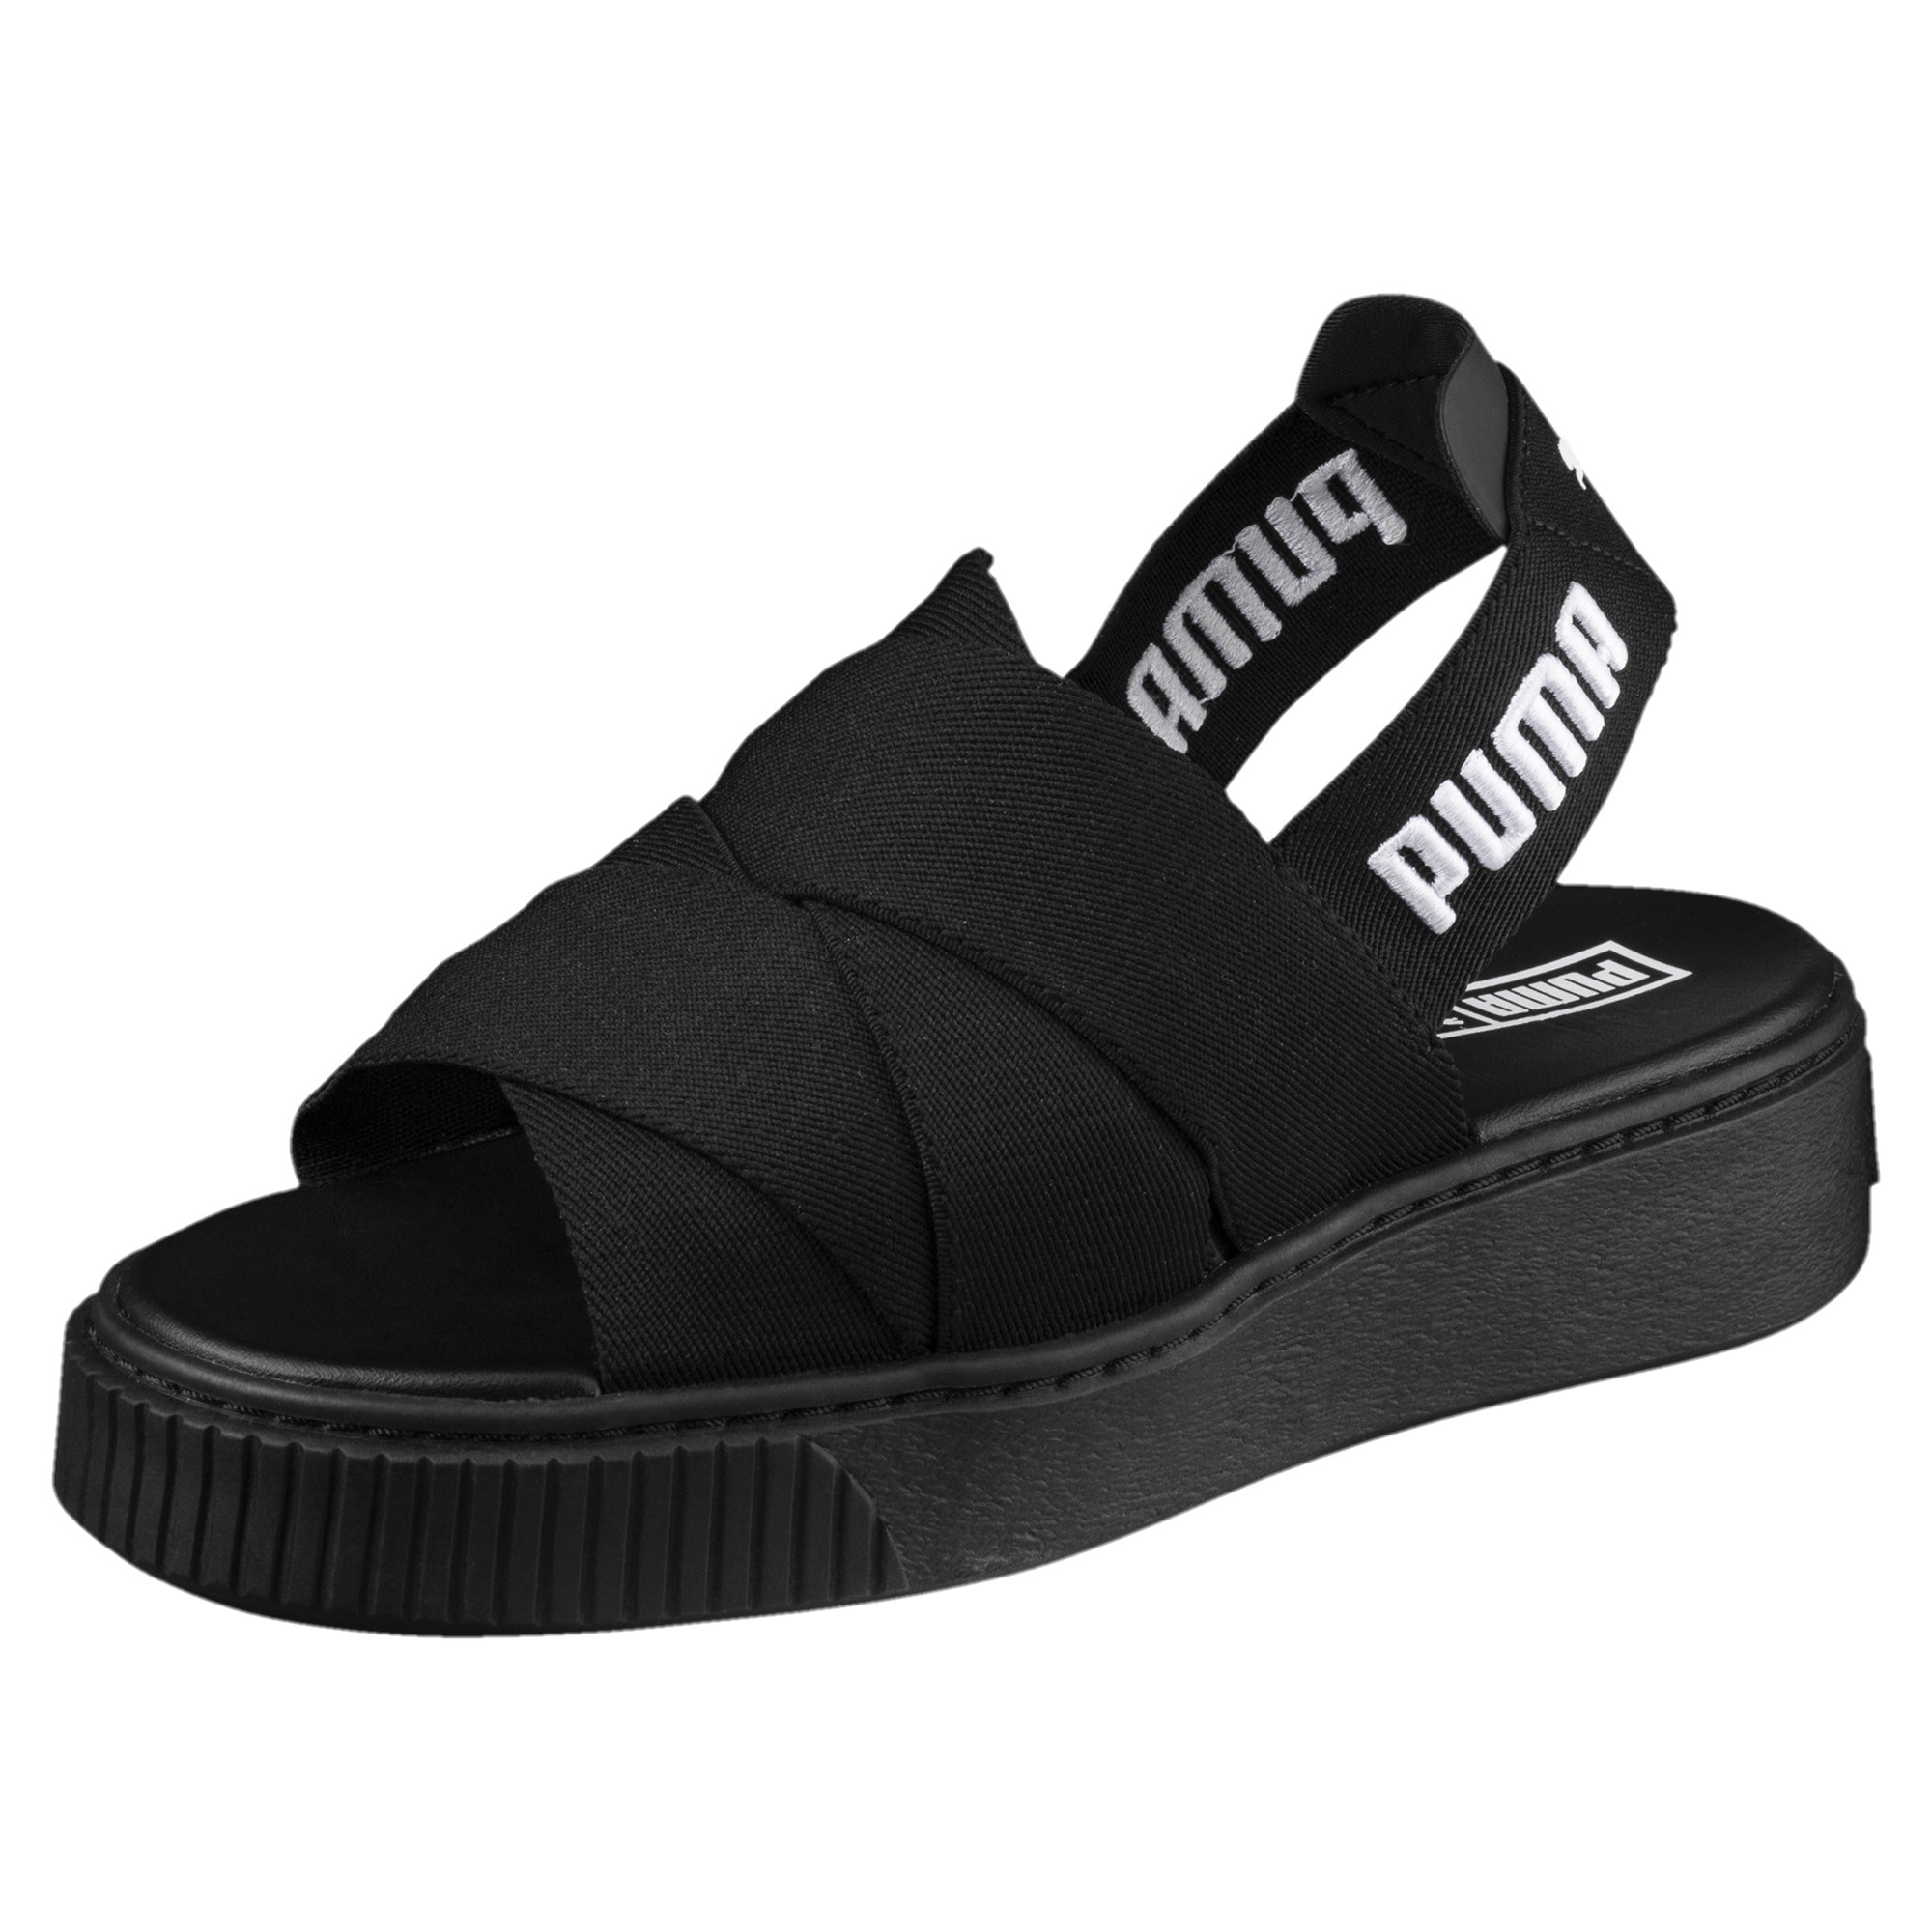 0c895565d4 Women's Platform Sandals | 10 - Black | Puma